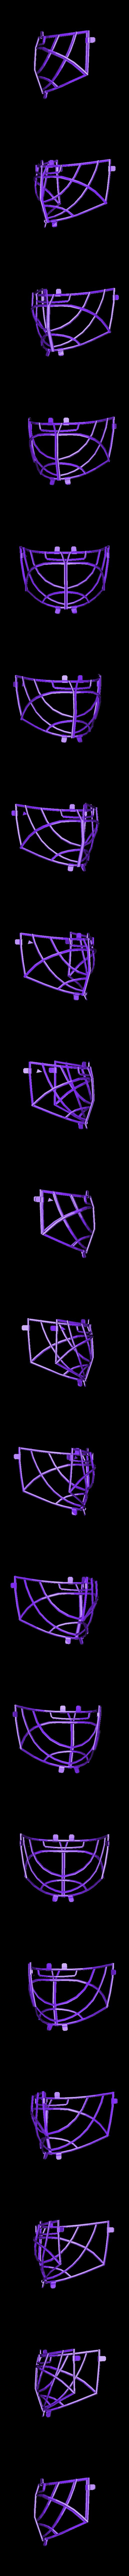 jb2.OBJ Télécharger fichier OBJ hockey goalie model no texture • Modèle à imprimer en 3D, NightCreativity